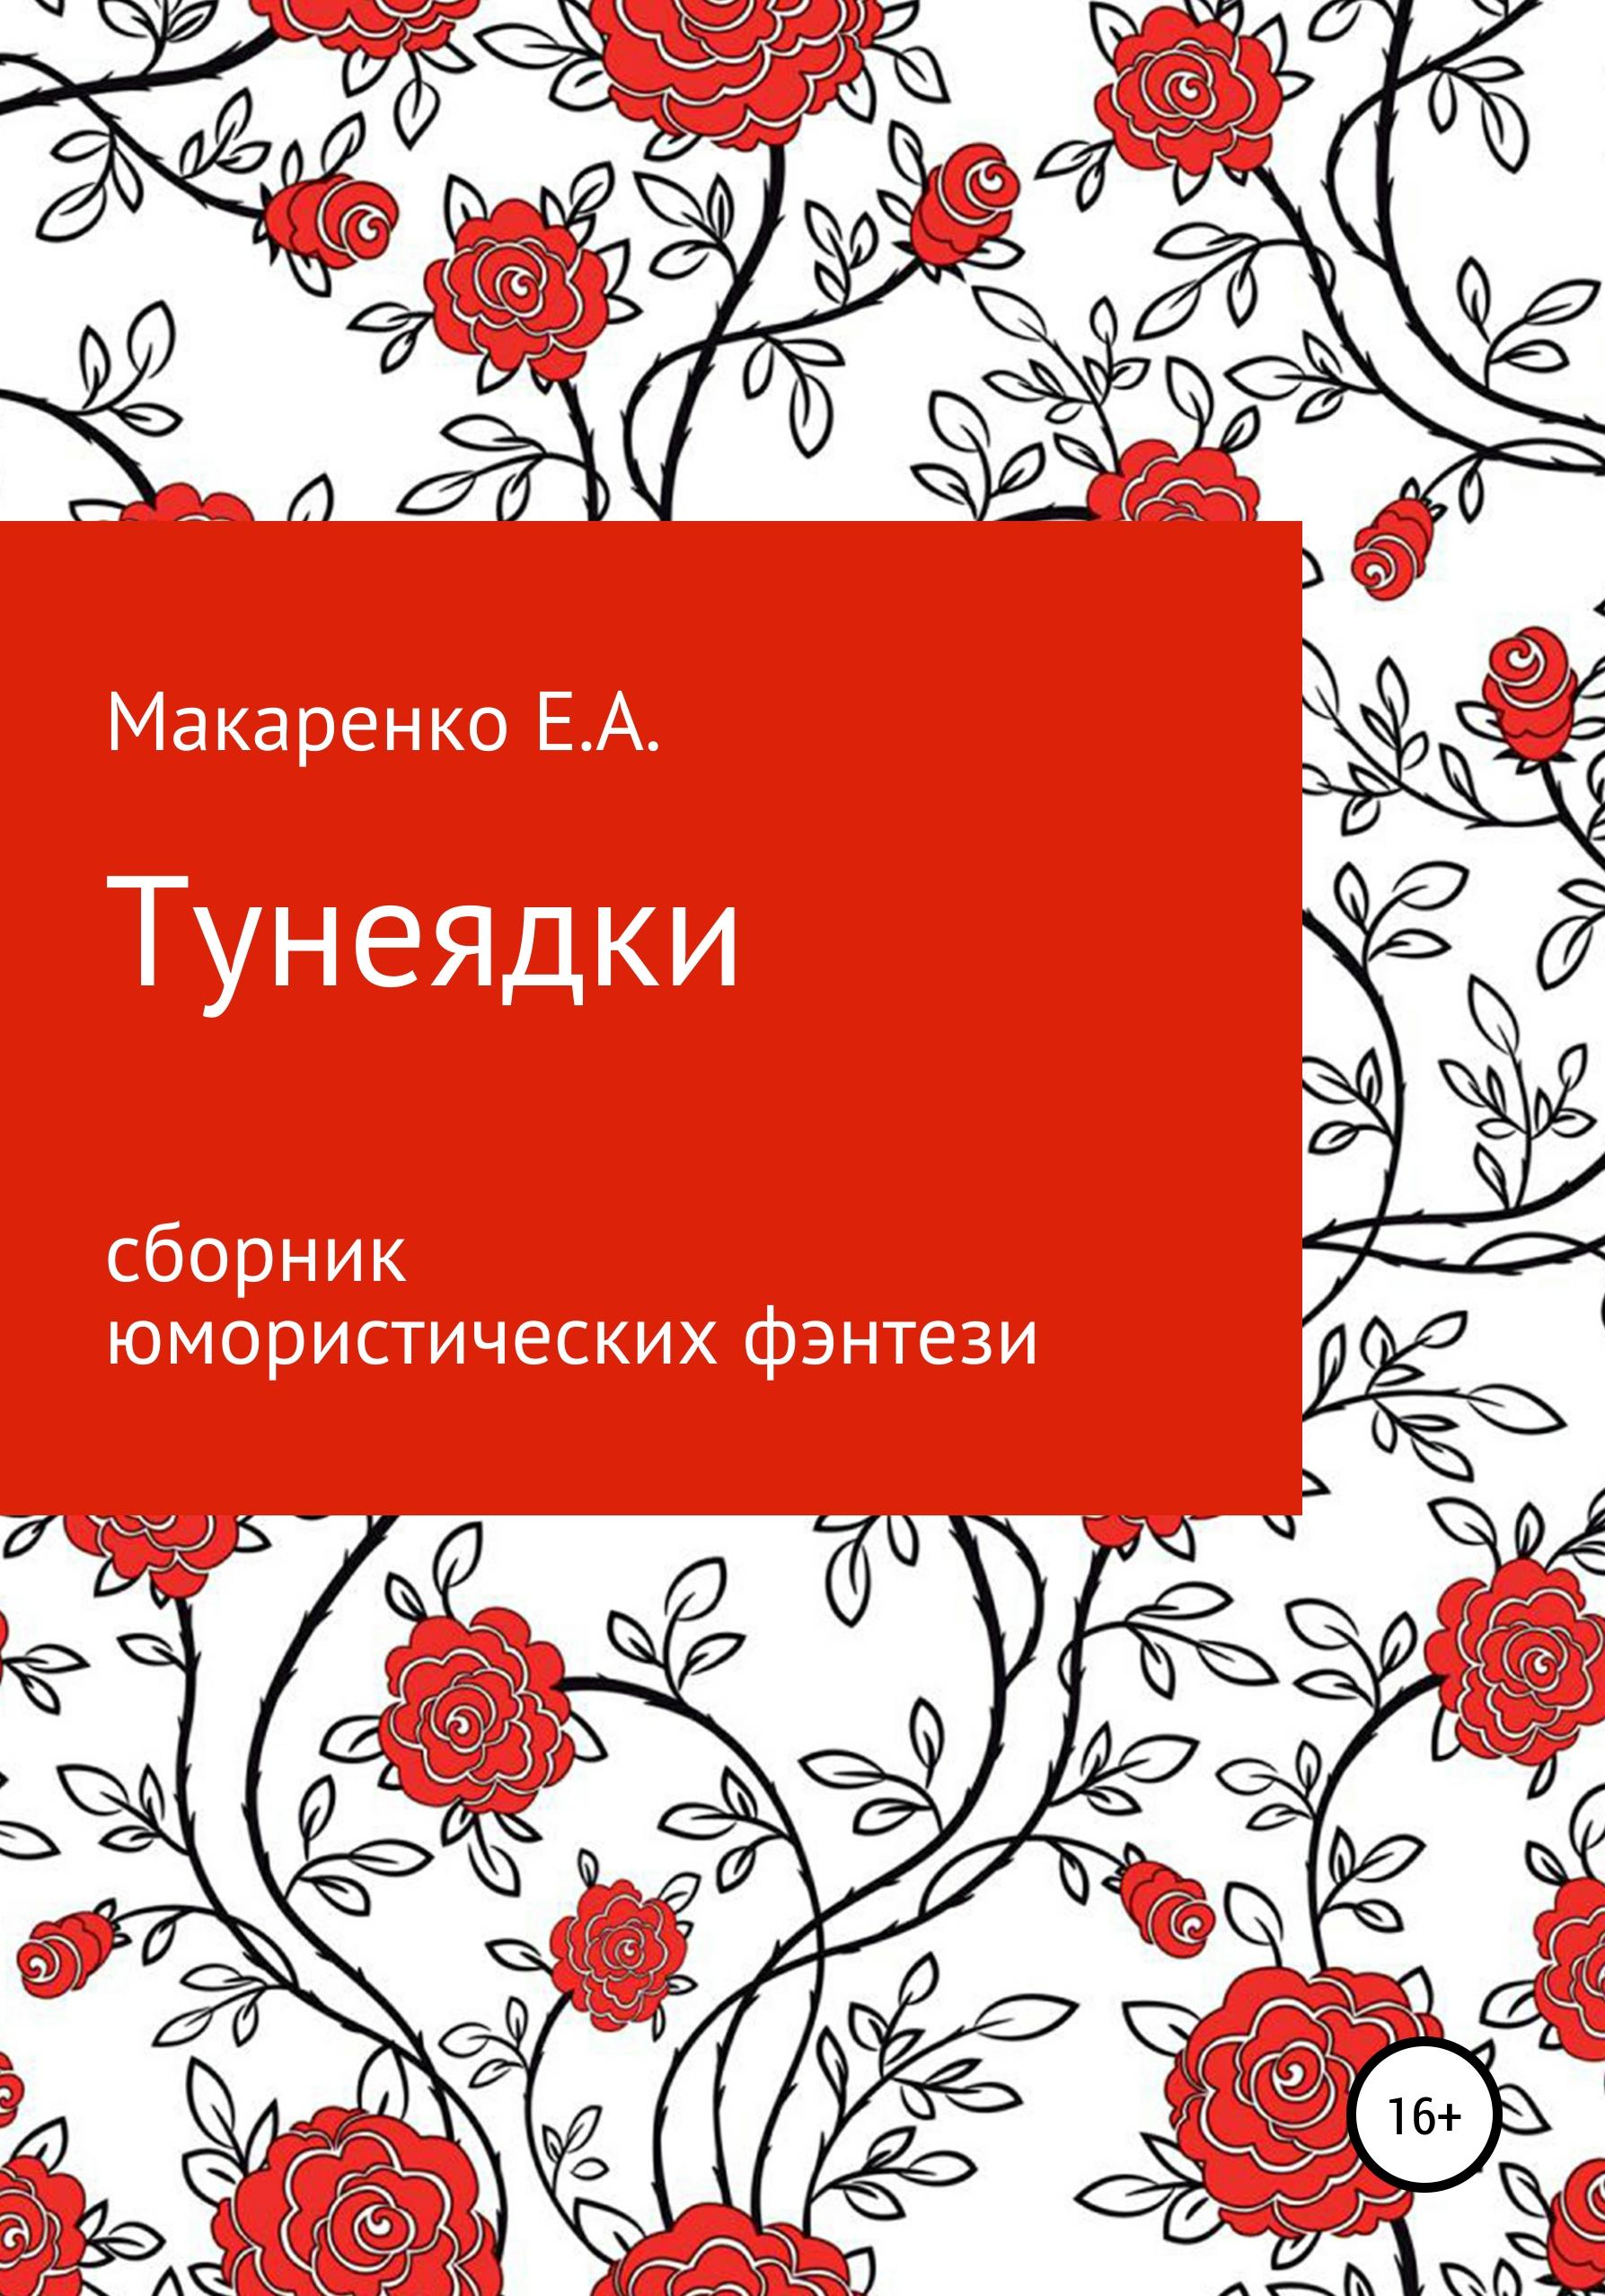 Евгения Александровна Макаренко Тунеядки л воронкова подружки идут в школу isbn 9785995132608